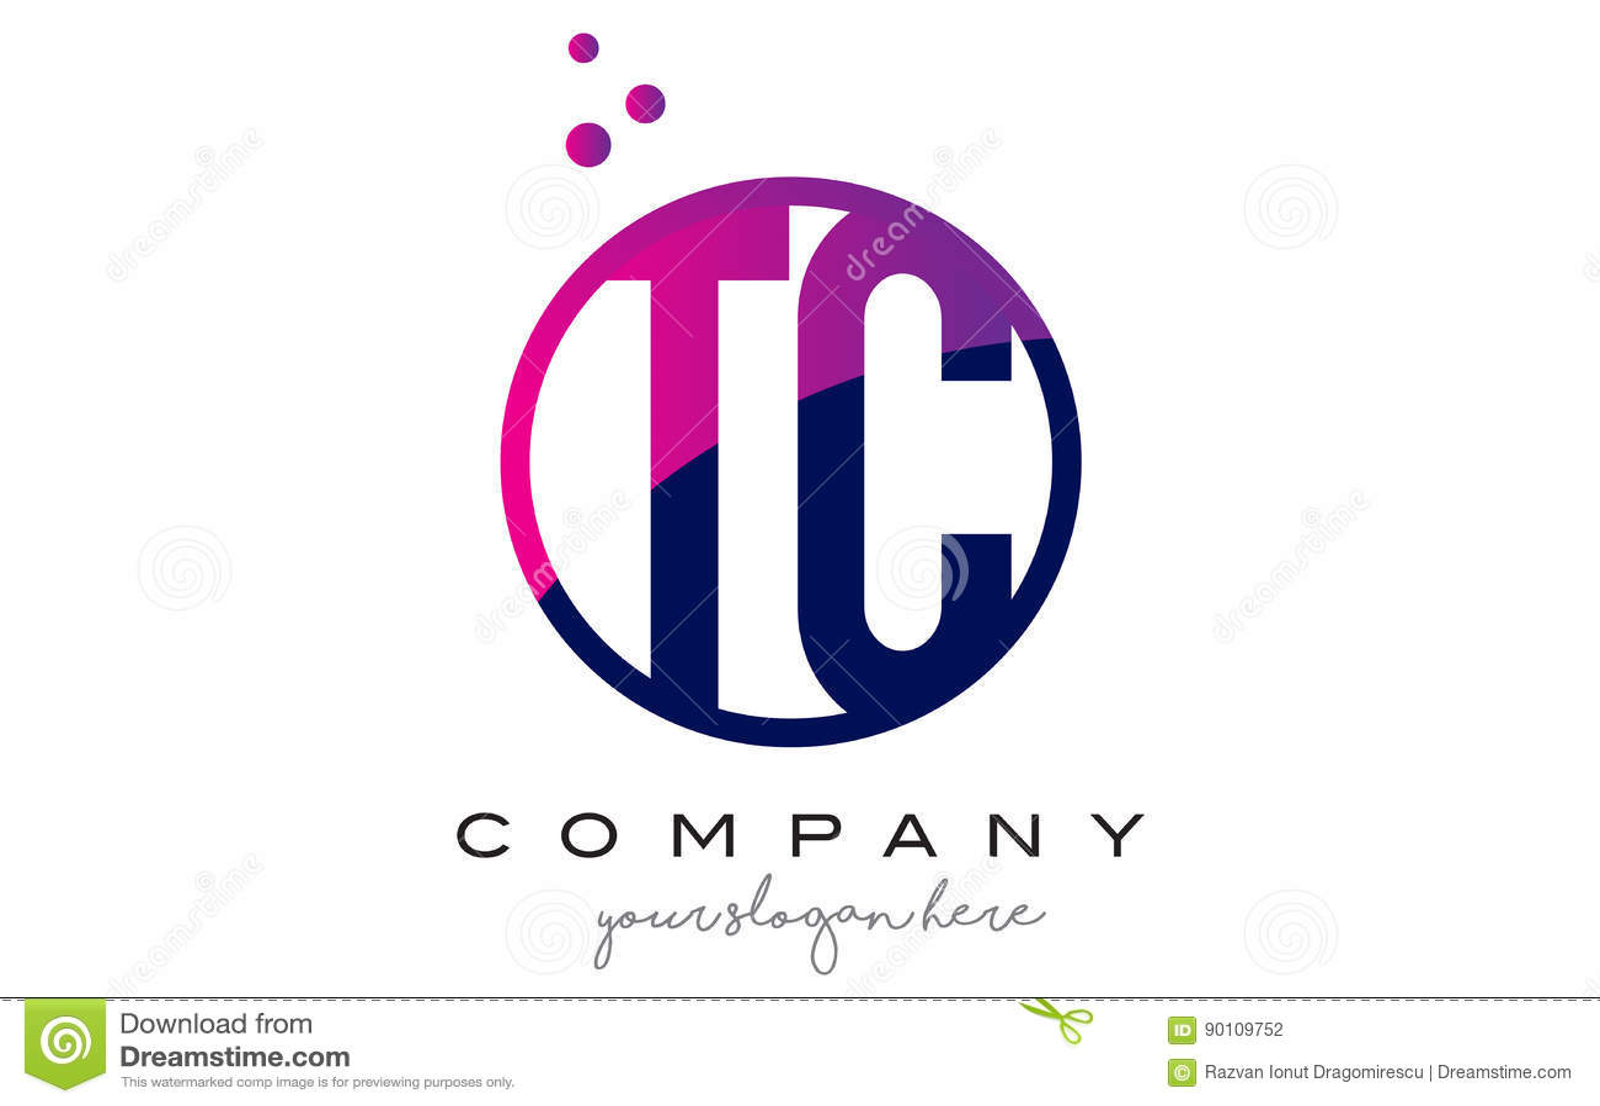 Tc t c circle letter logo design with purple dots bubbles stock tc t c circle letter logo design with purple dots bubbles biocorpaavc Images